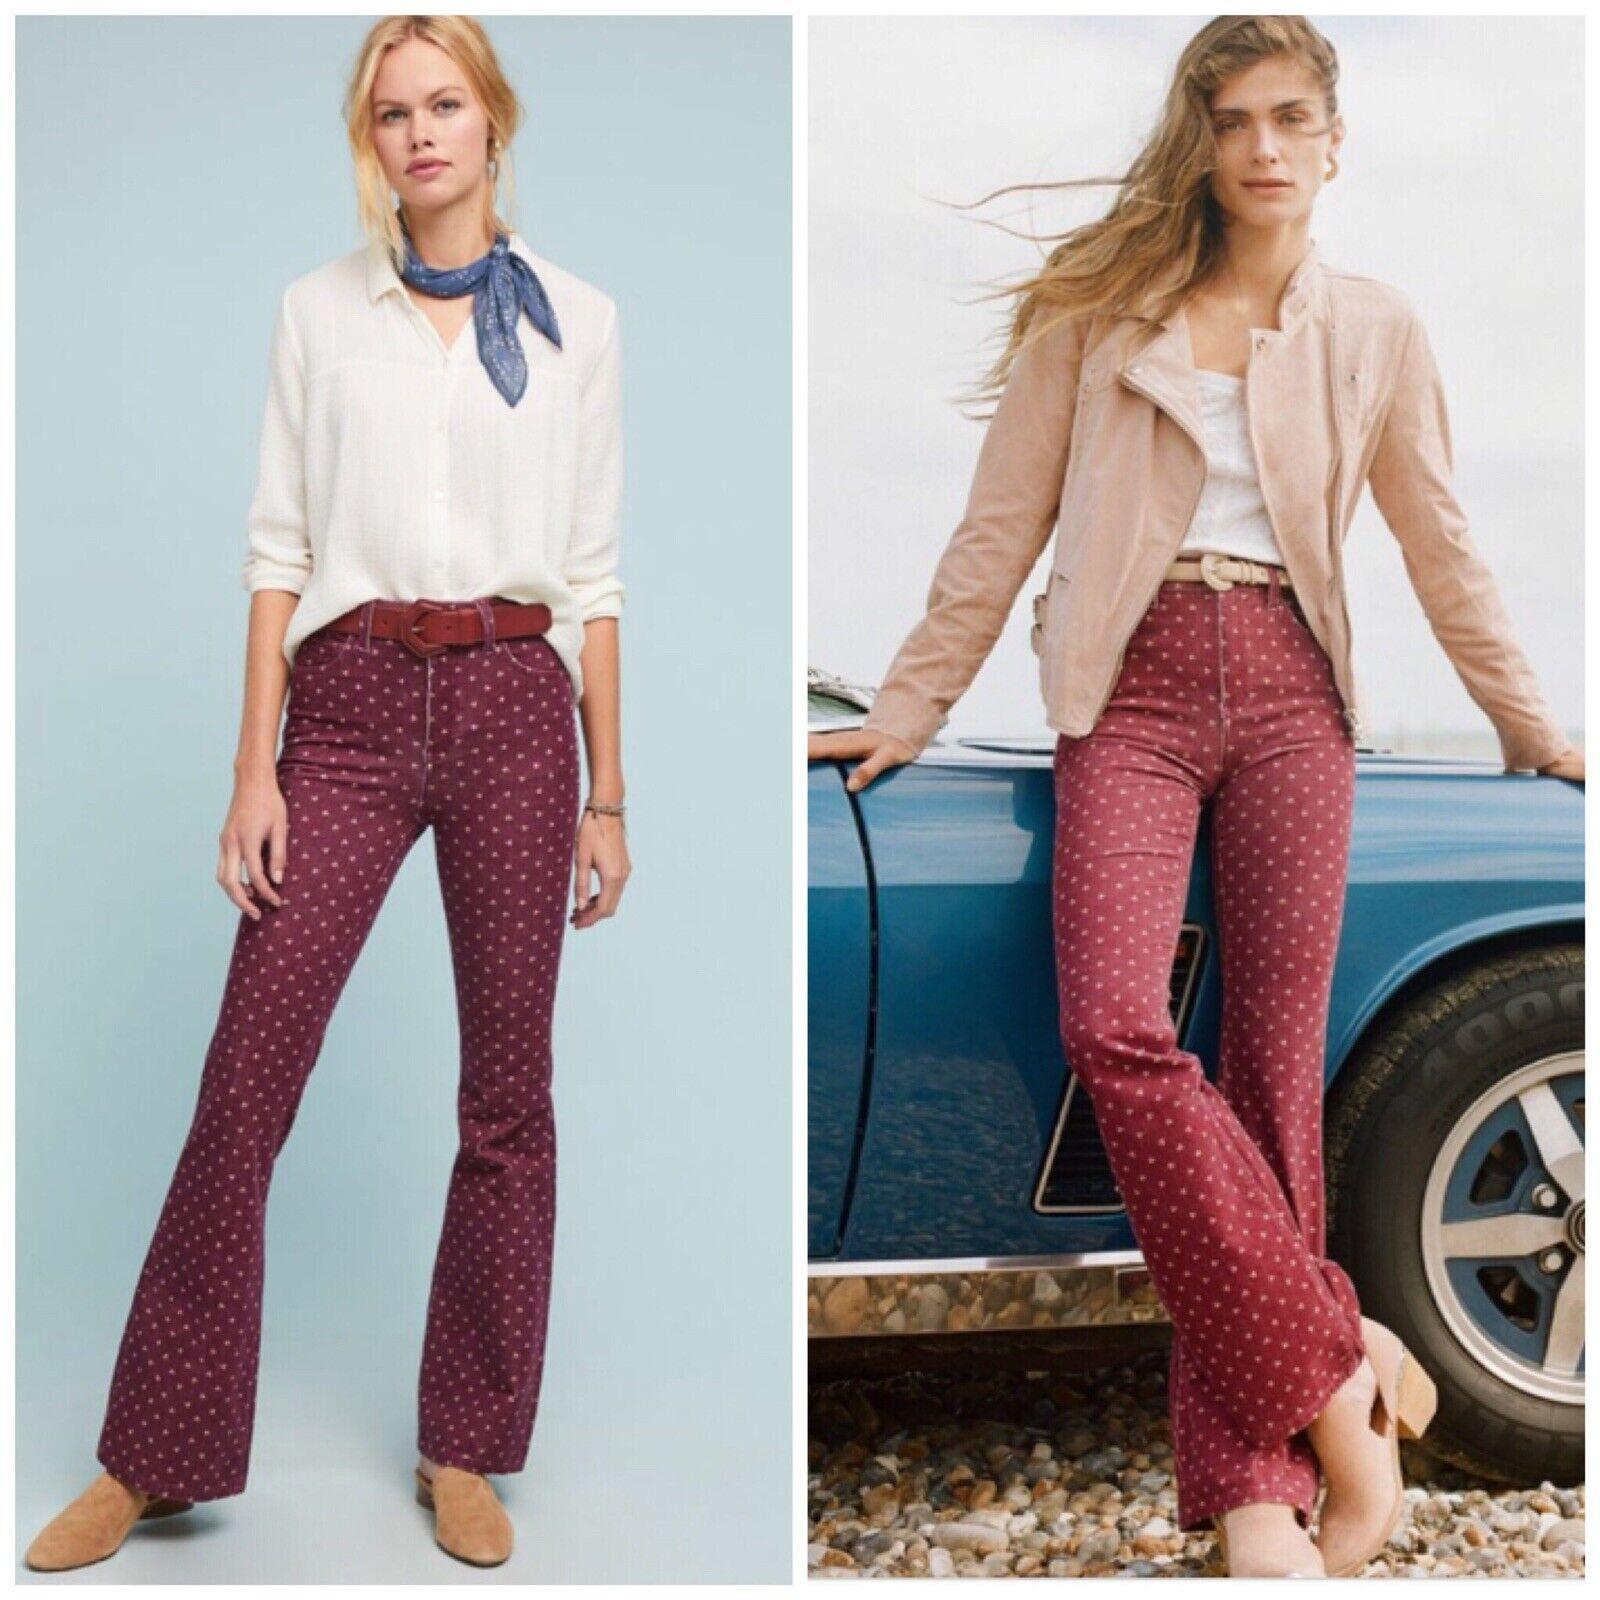 Anthropologie Pilcro High-Rise Bootcut Jeans Woman Corduroy New Size 27 Retro